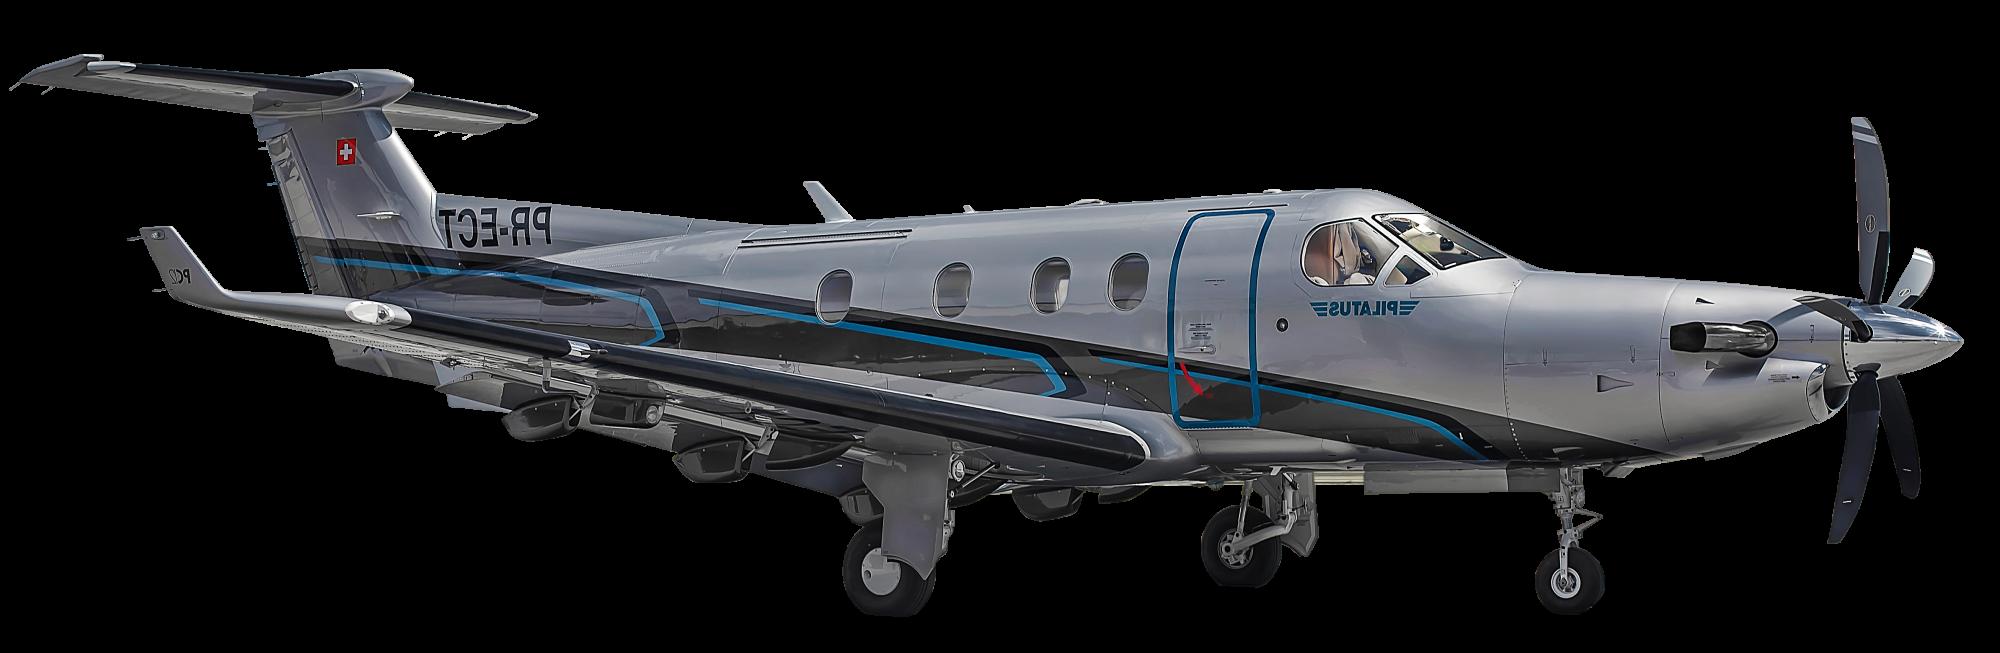 Photo of Pilatus PC-12